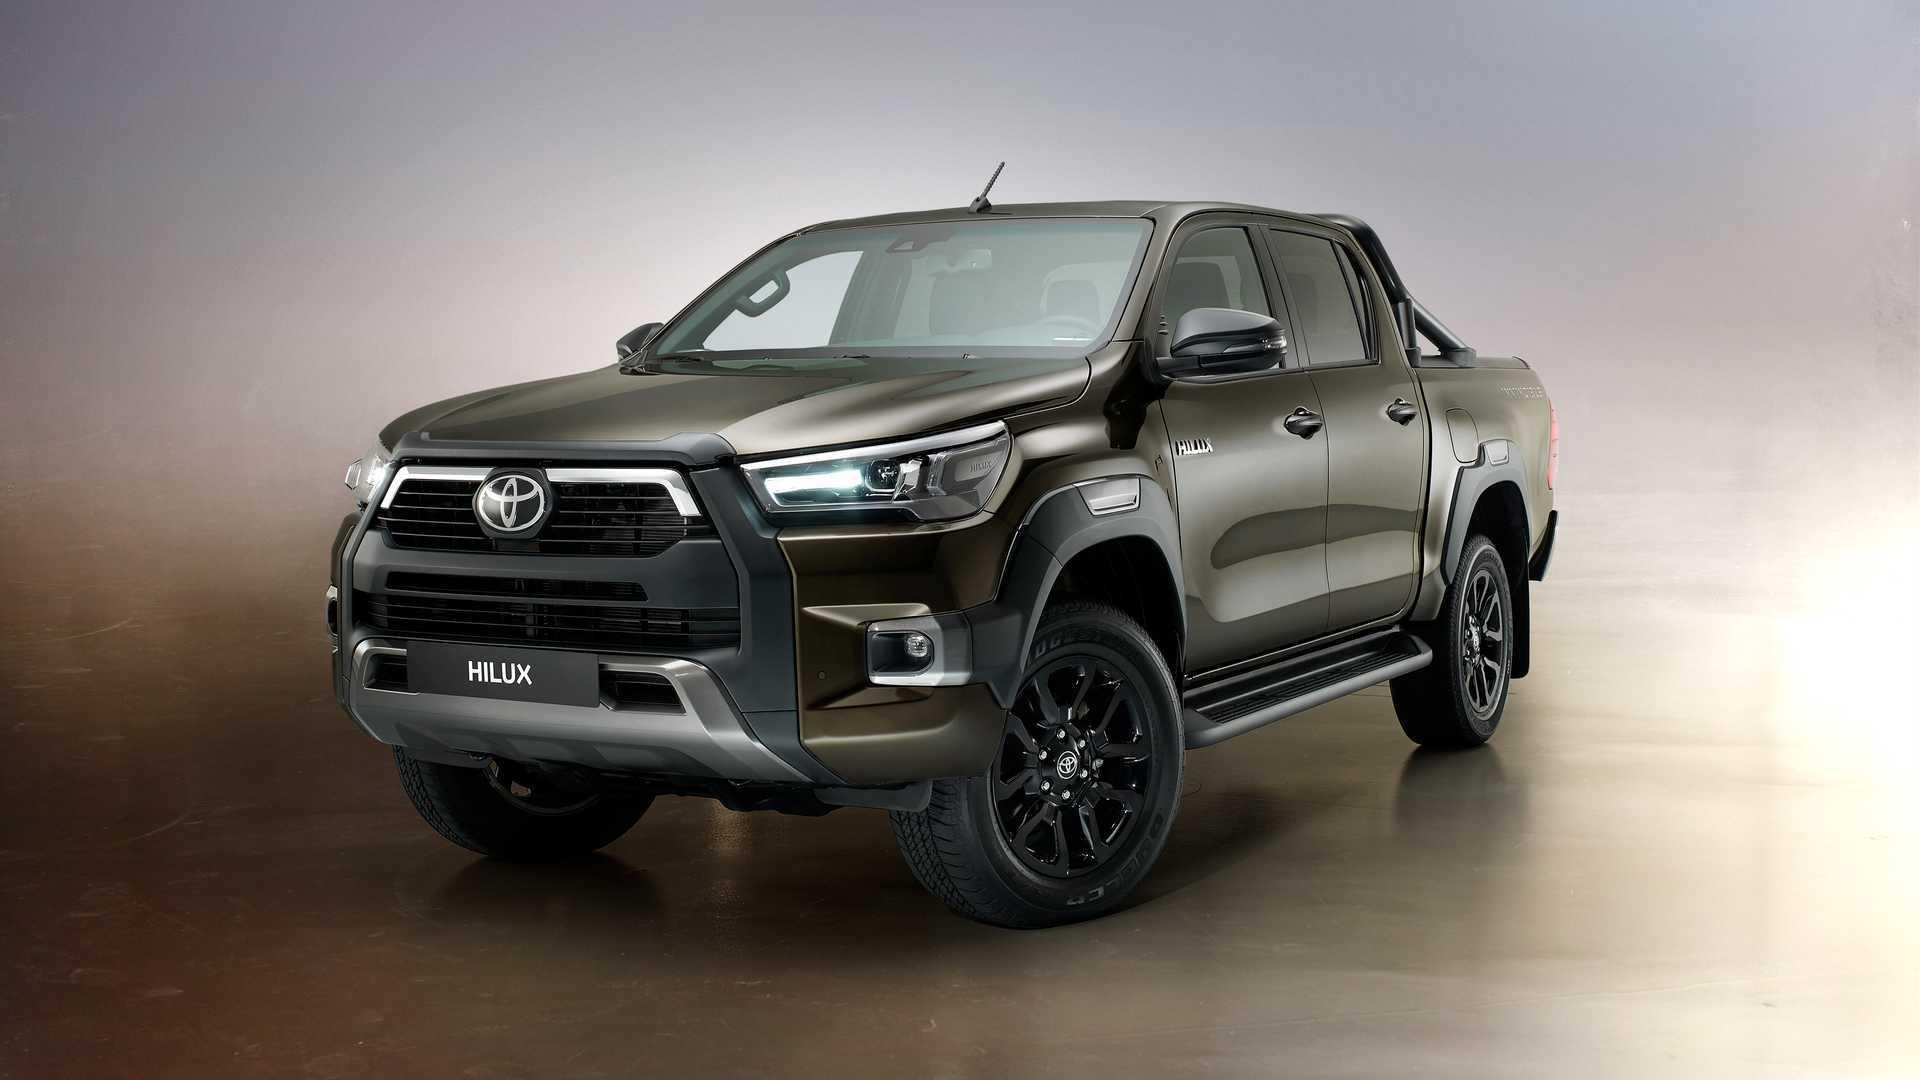 Kelebihan Harga Toyota Hilux Tangguh